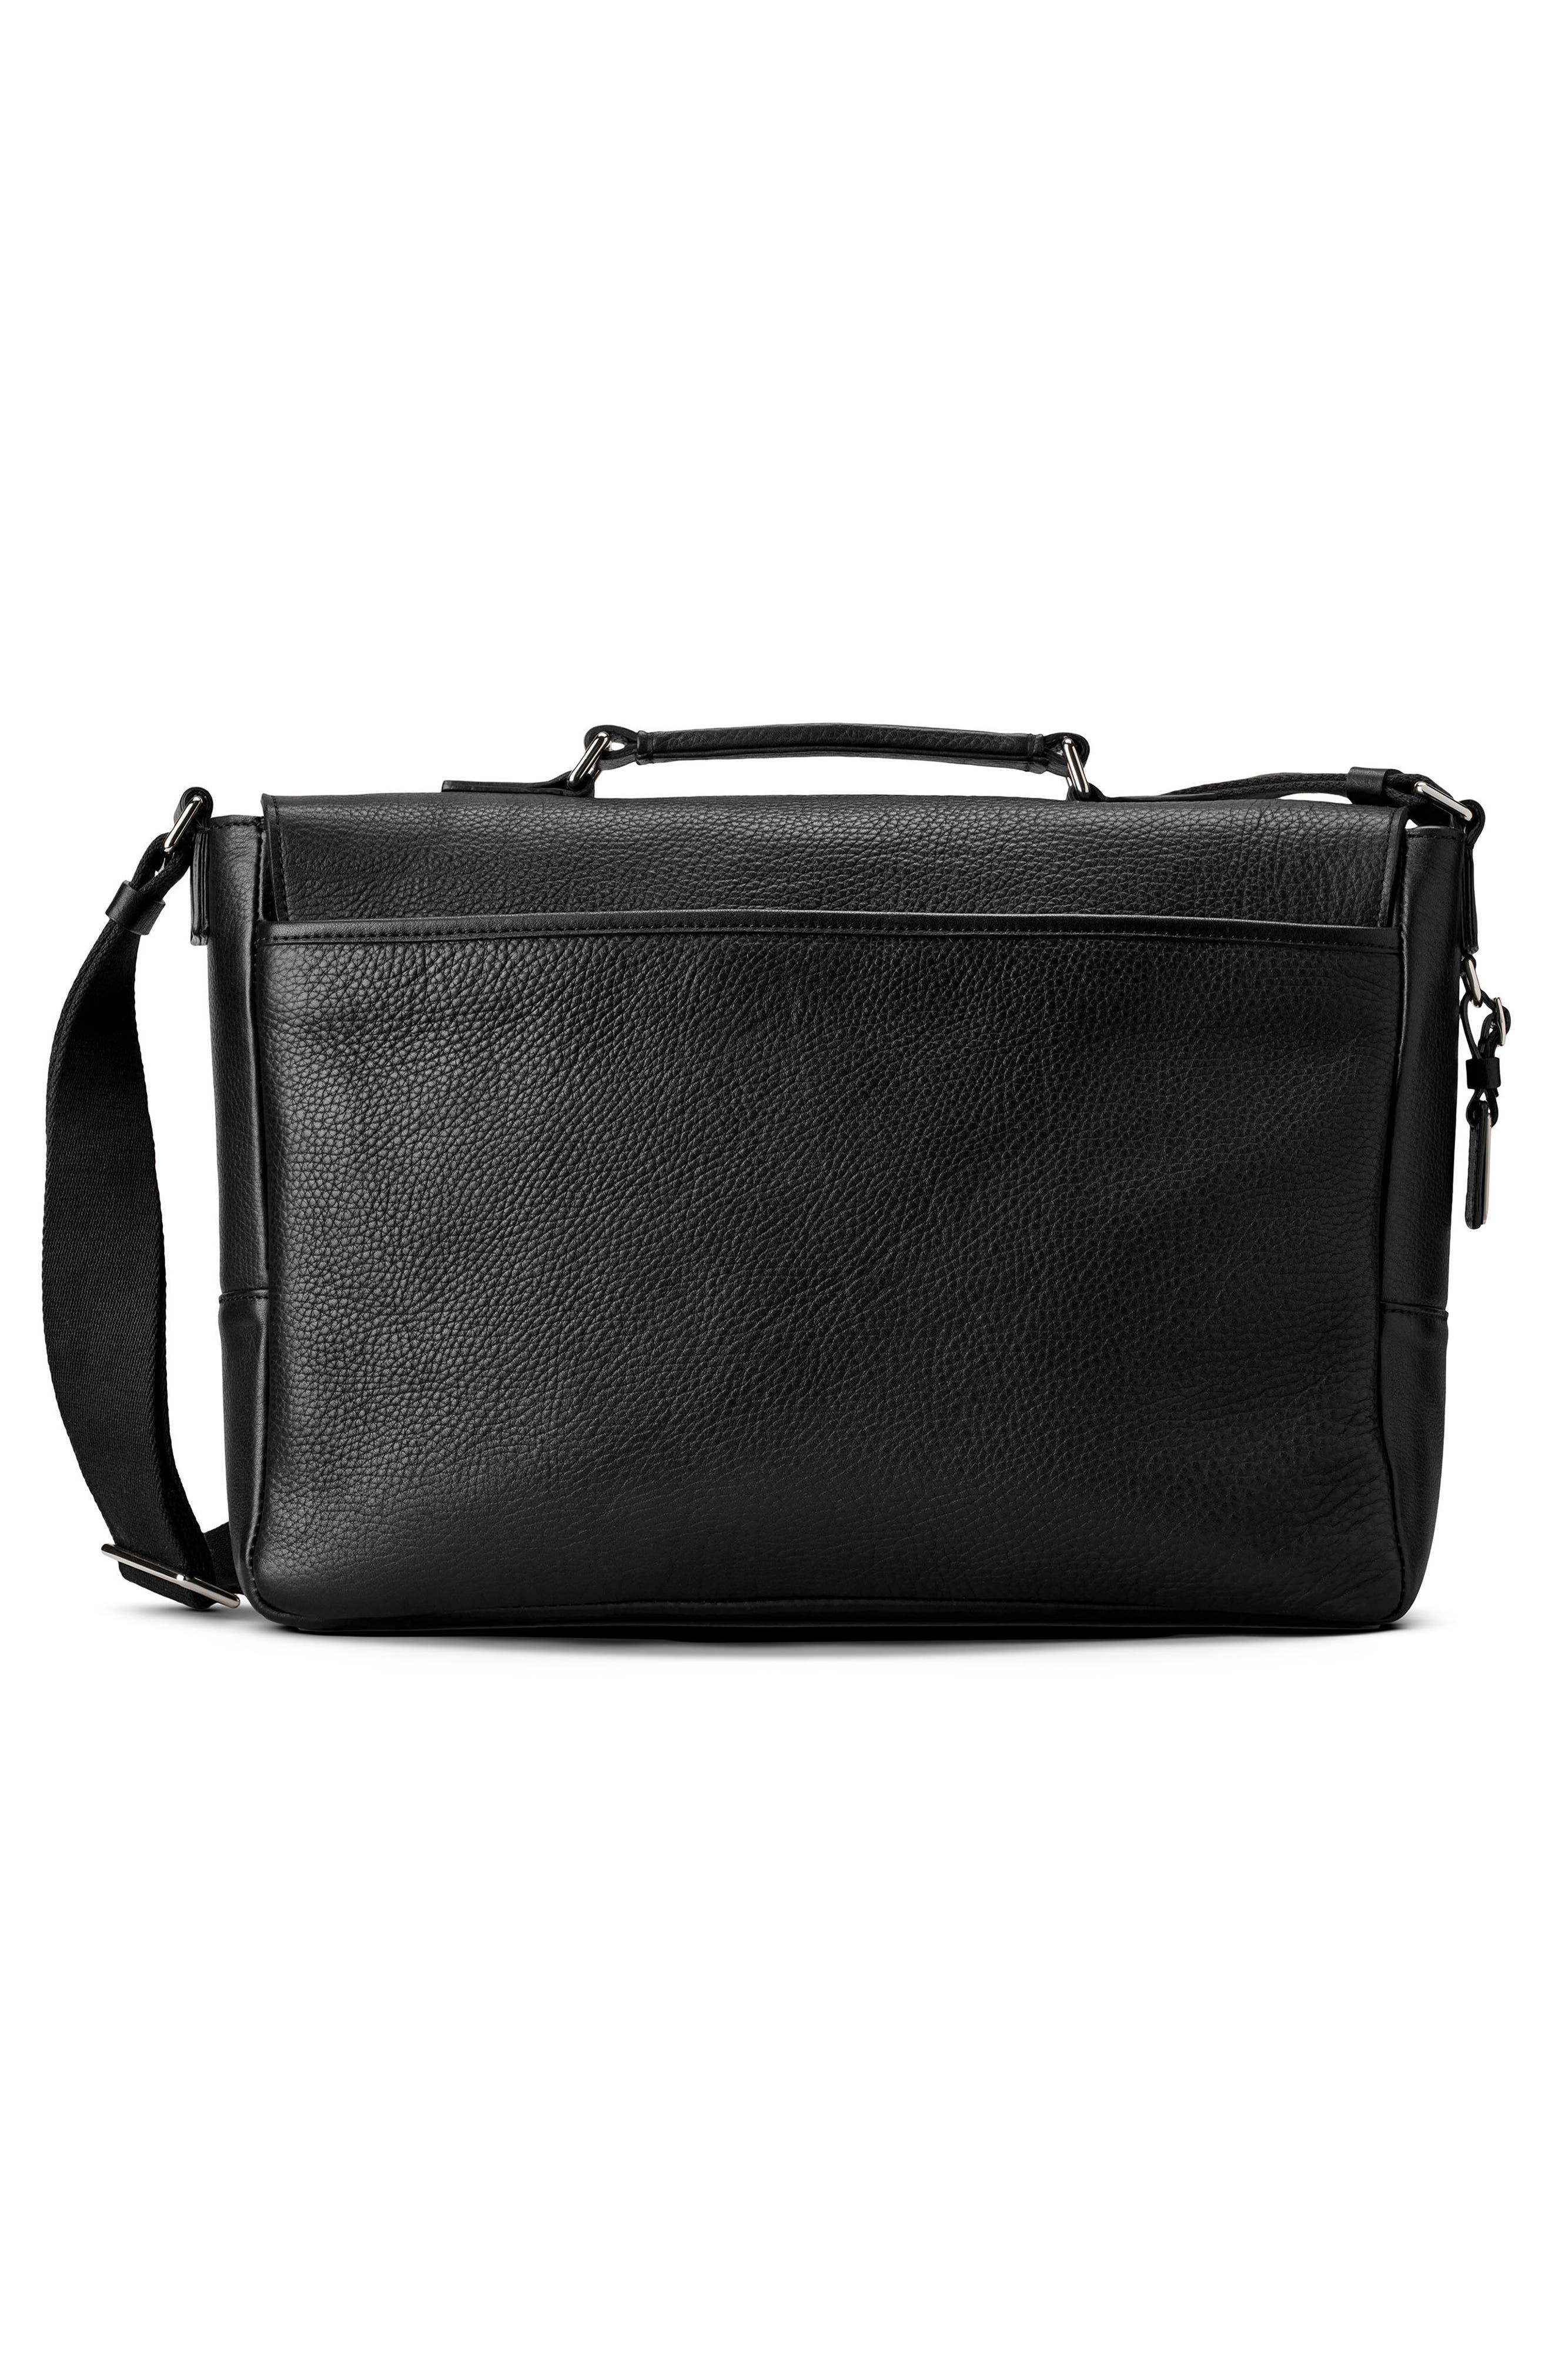 Leather Messenger Bag,                             Alternate thumbnail 2, color,                             BLACK